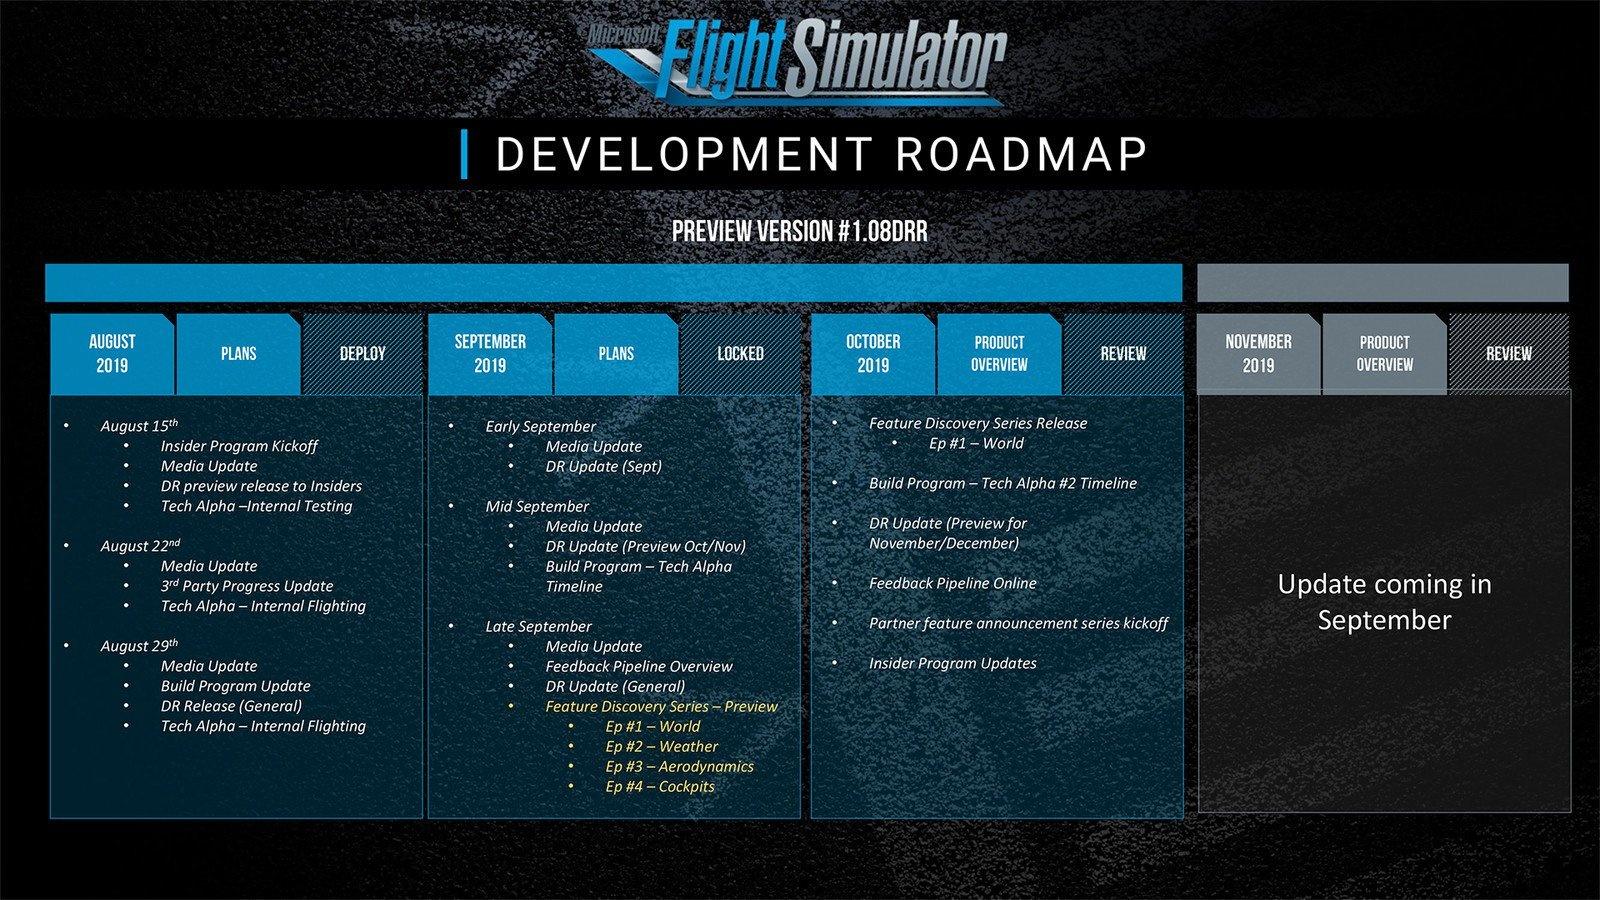 Microsoft Flight Simulator Development Roadmap